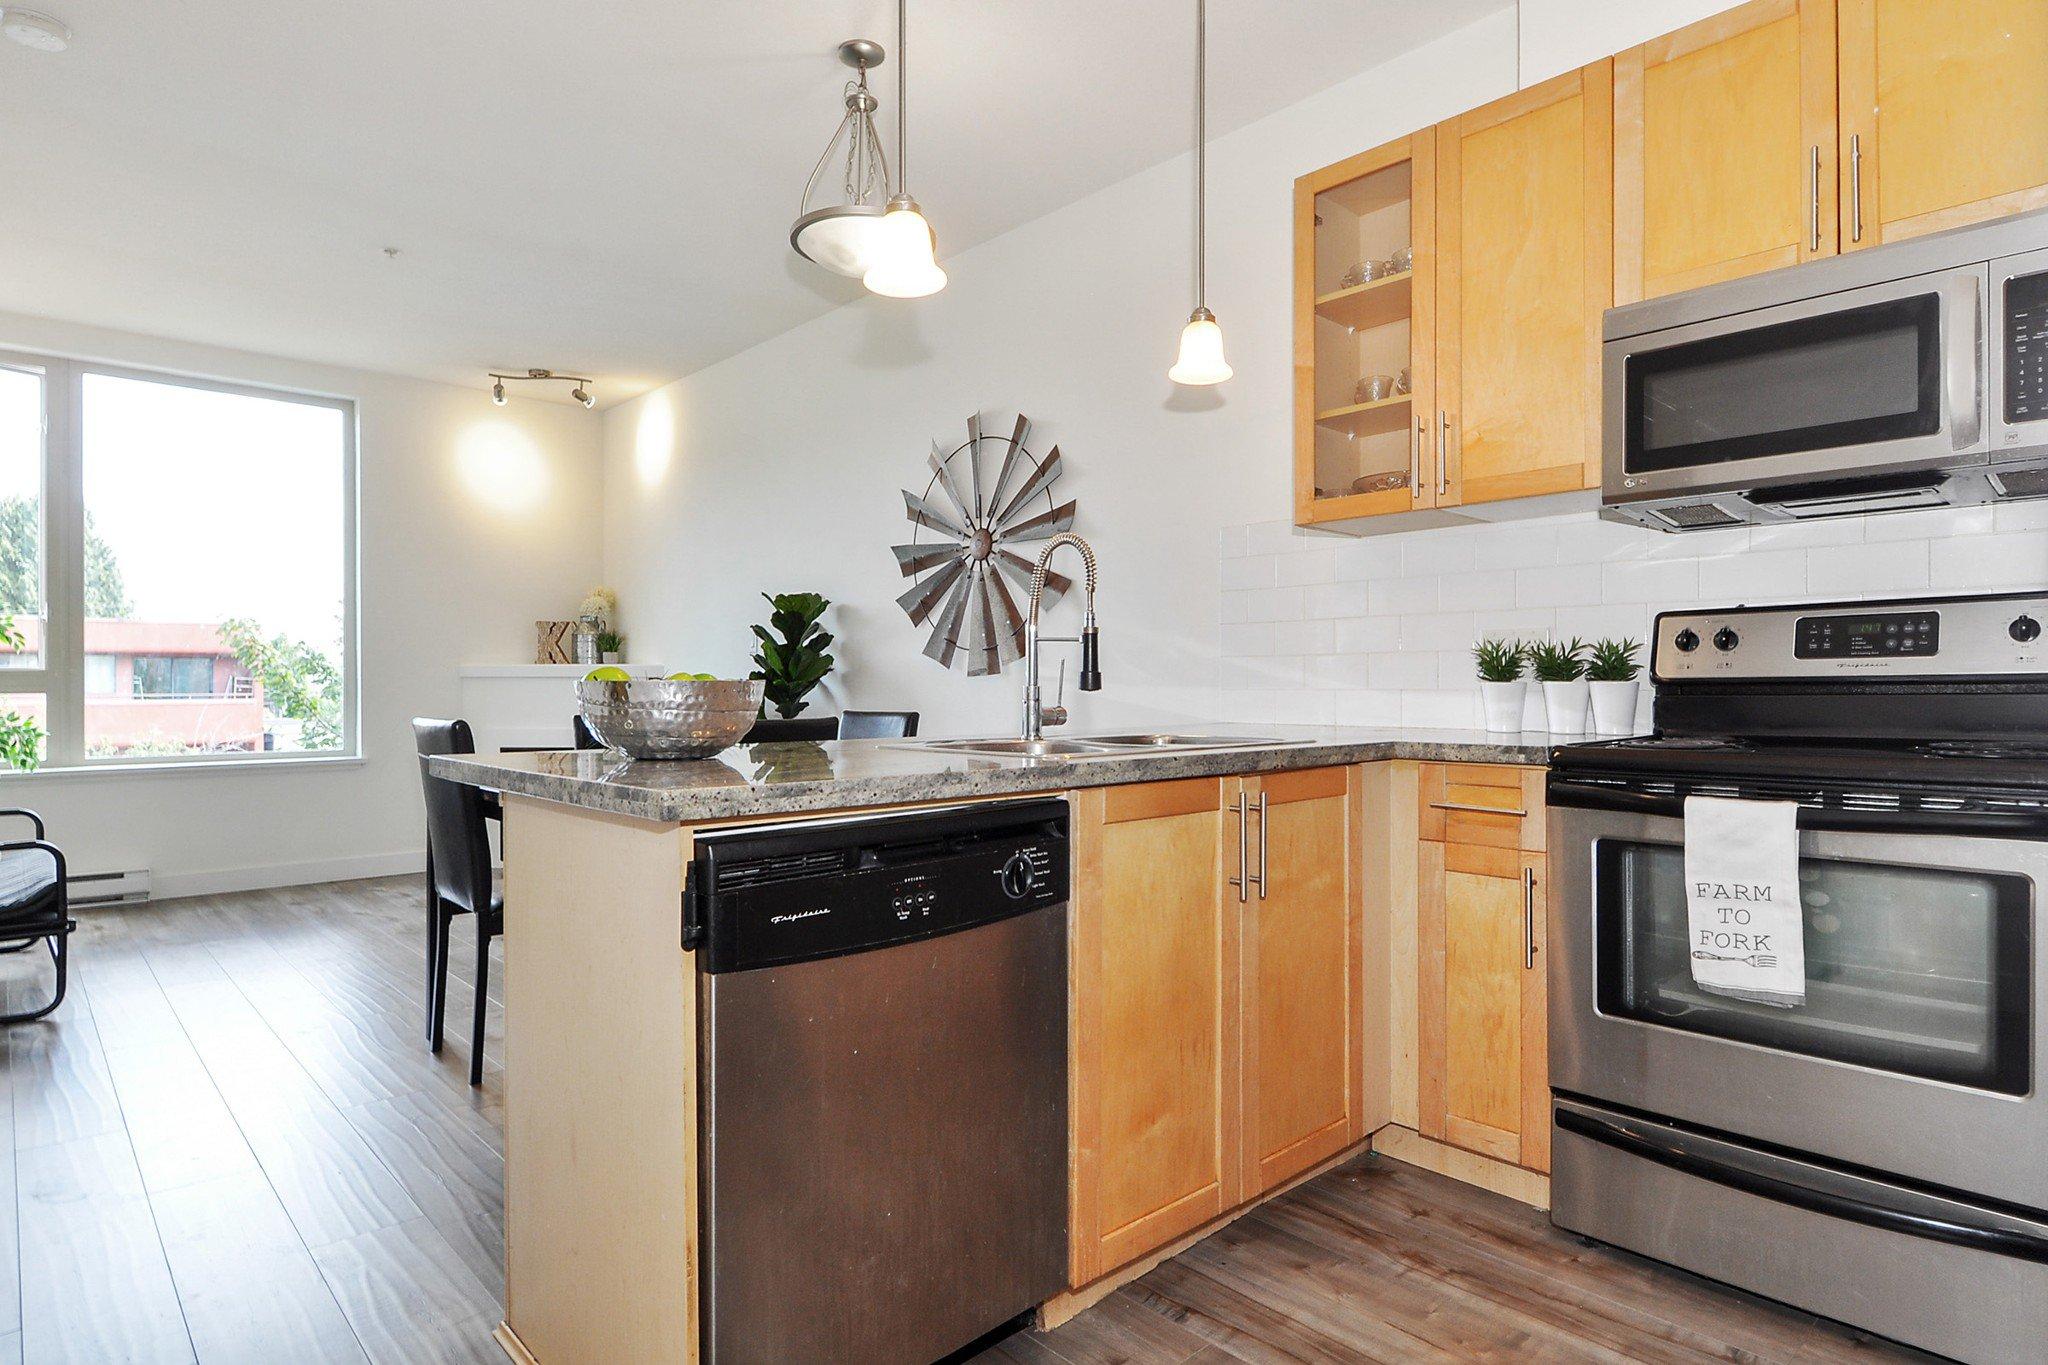 "Photo 9: Photos: 302 688 E 17TH Avenue in Vancouver: Fraser VE Condo for sale in ""MONDELLA"" (Vancouver East)  : MLS®# R2403902"